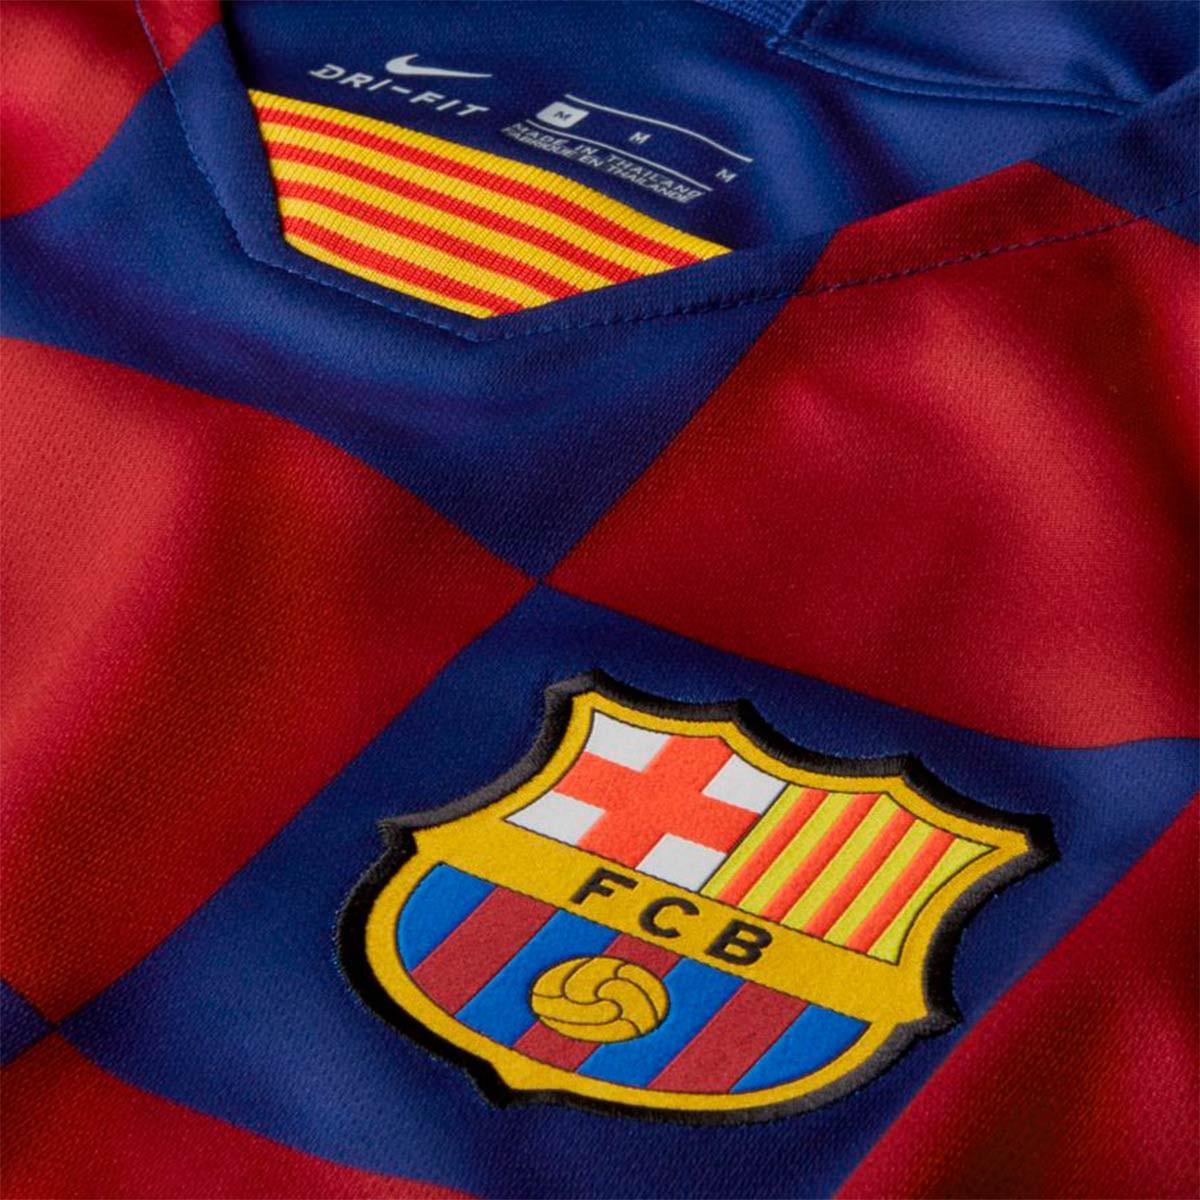 0dface33cc2 Camiseta FC Barcelona Breathe Stadium SS Primera Equipación 2019-2020 Deep  royal blue-Varsity maize